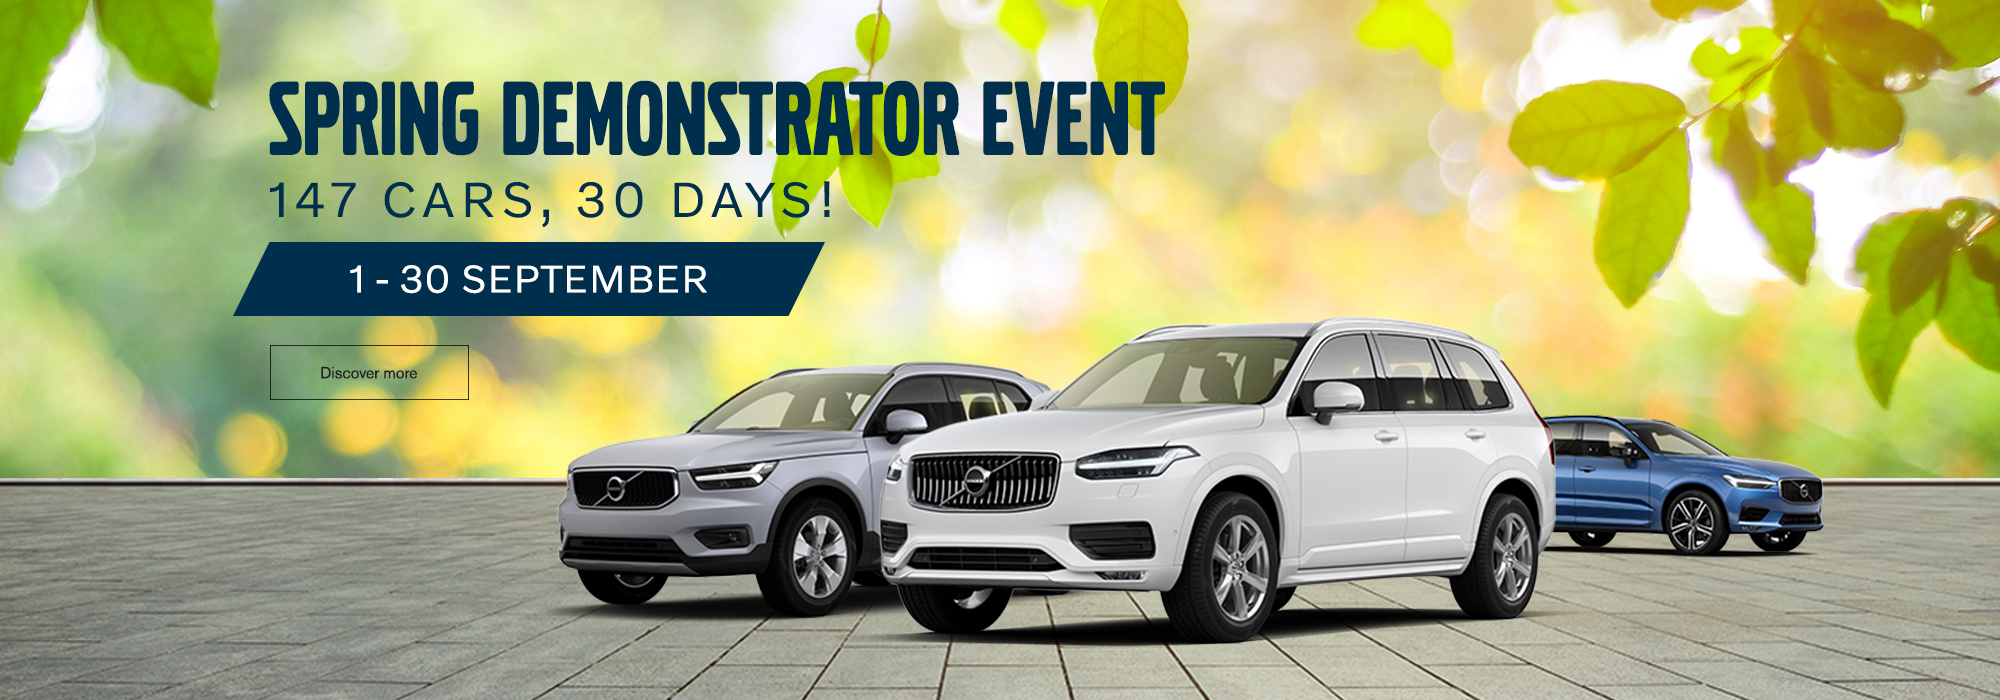 Volvo Dealer Parramatta - Volvo Cars Parramatta